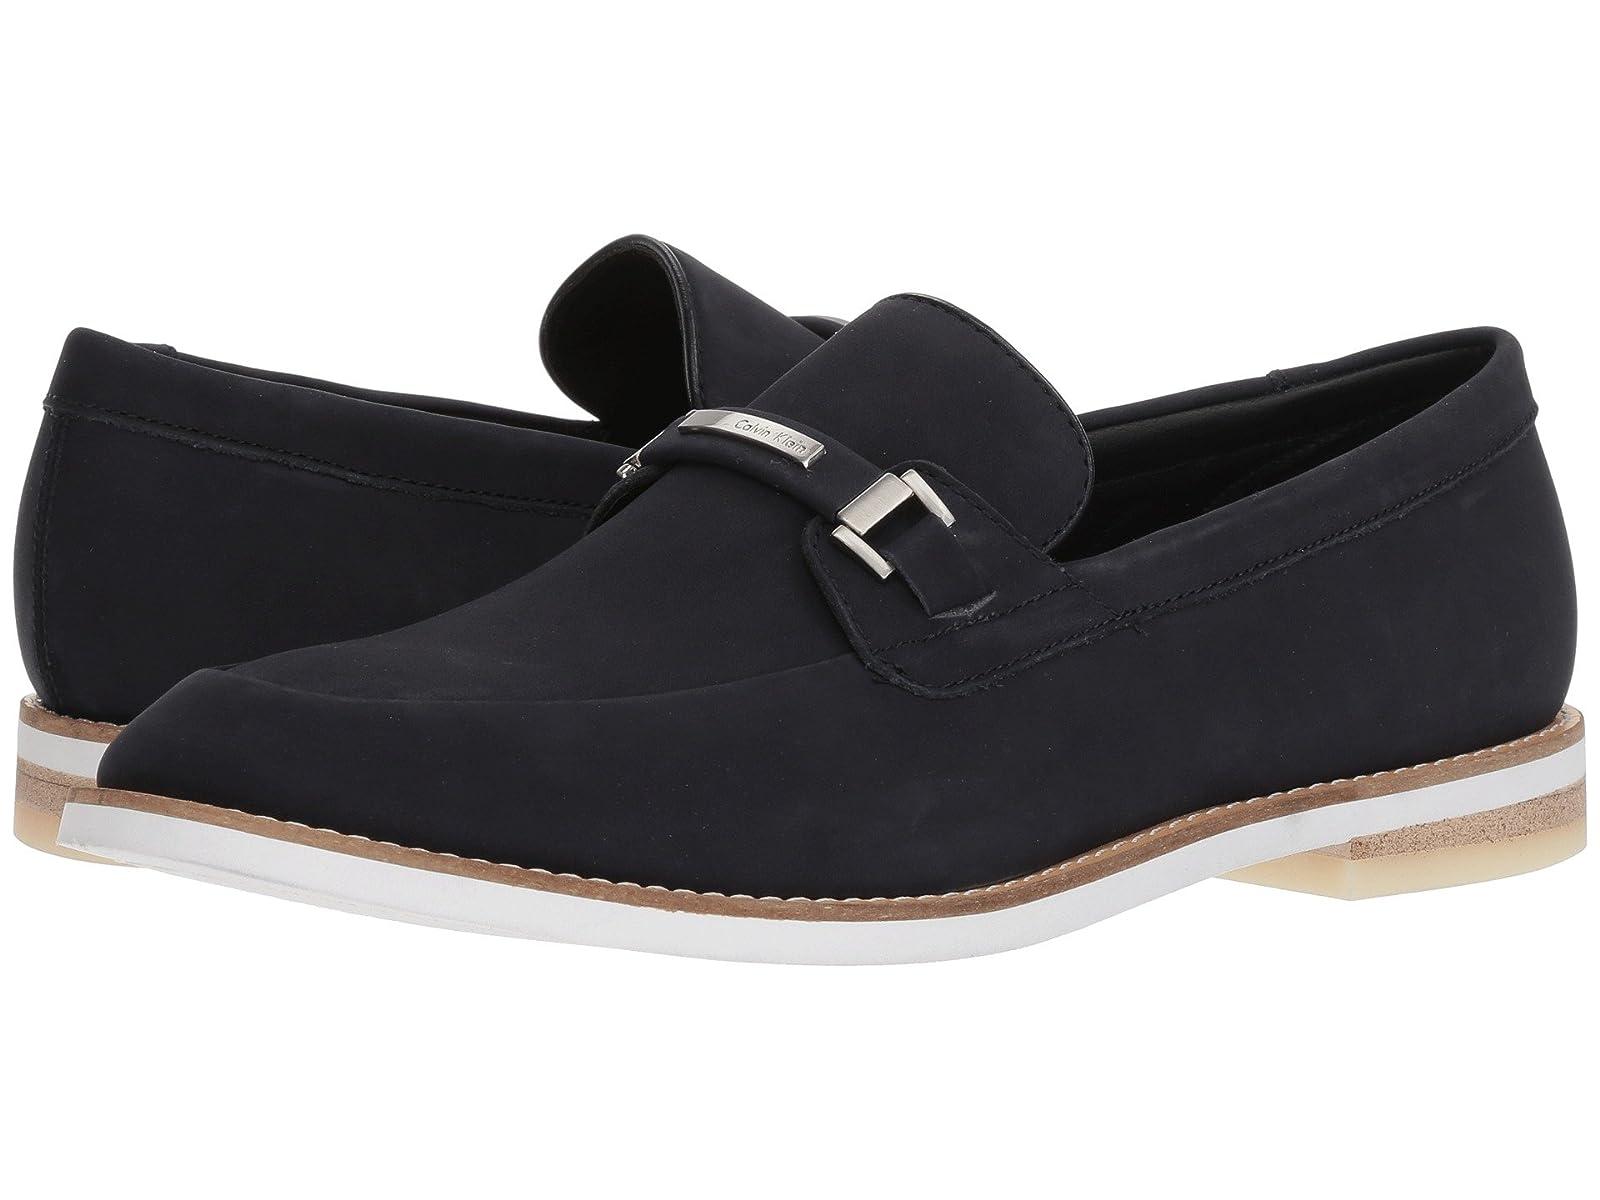 Calvin Klein AdlerAtmospheric grades have affordable shoes